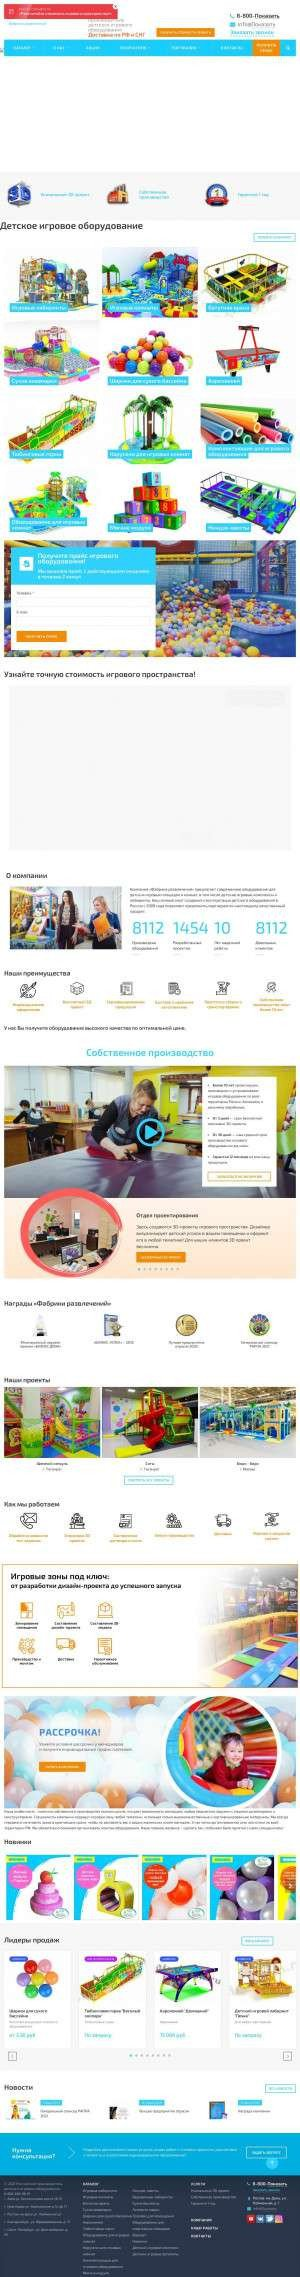 Предпросмотр для rostov-na-donu.atrakzion.ru — Фабрика Развлечений